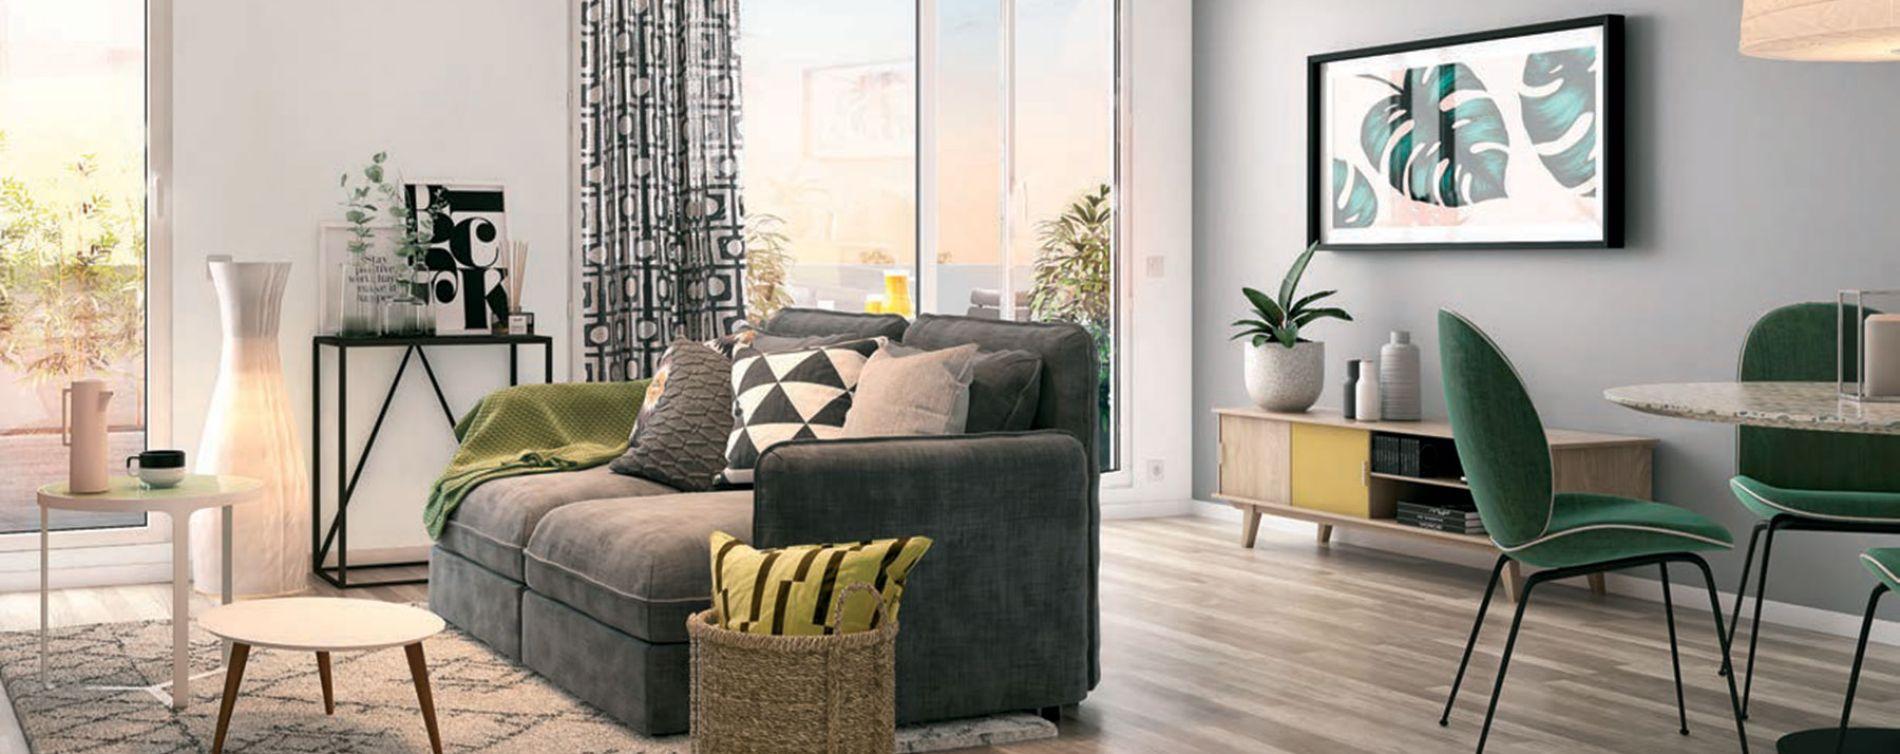 Bondy : programme immobilier neuve « Programme immobilier n°217479 » (2)